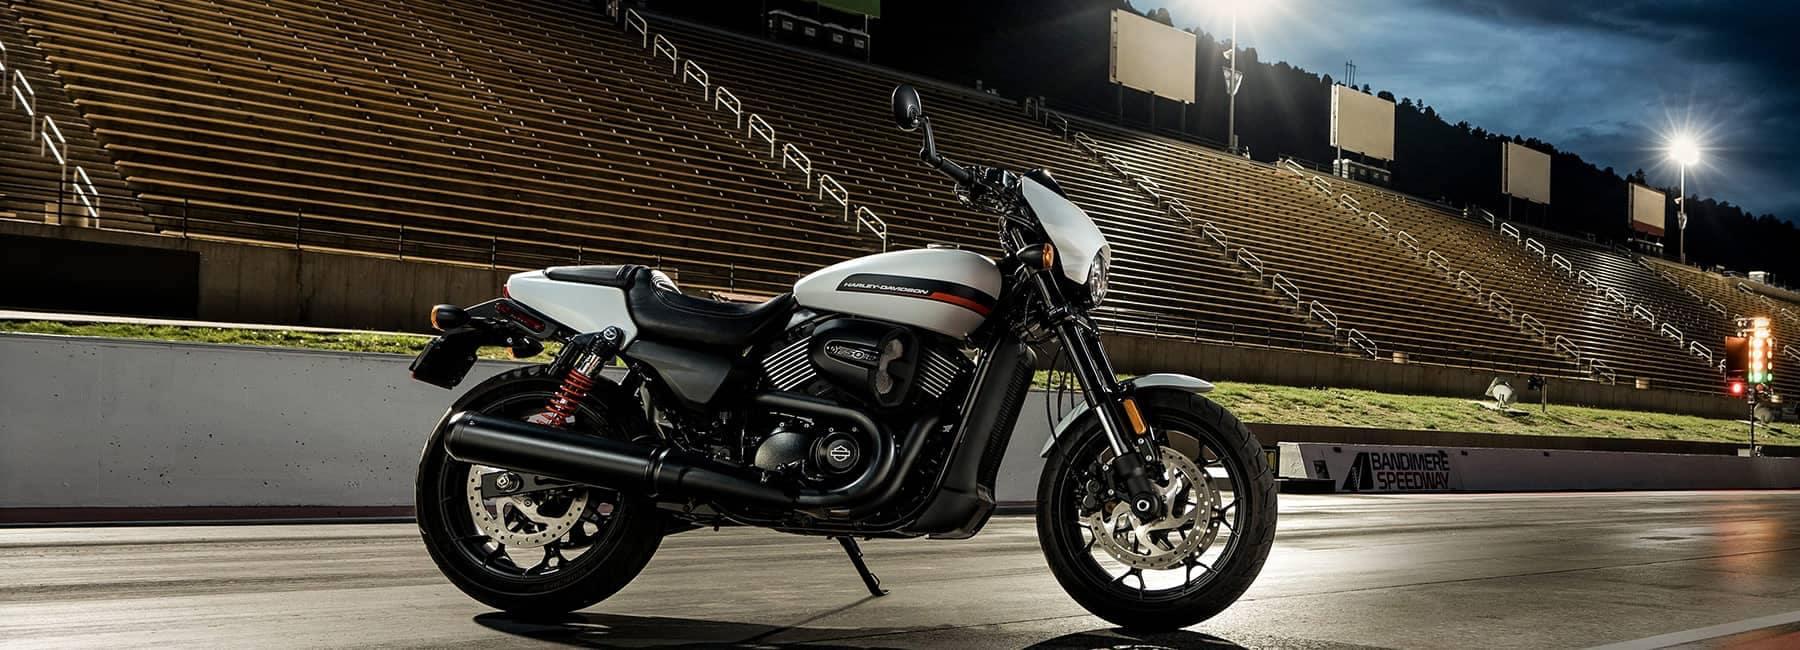 Harley-Davidson Dealership near Morrow GA